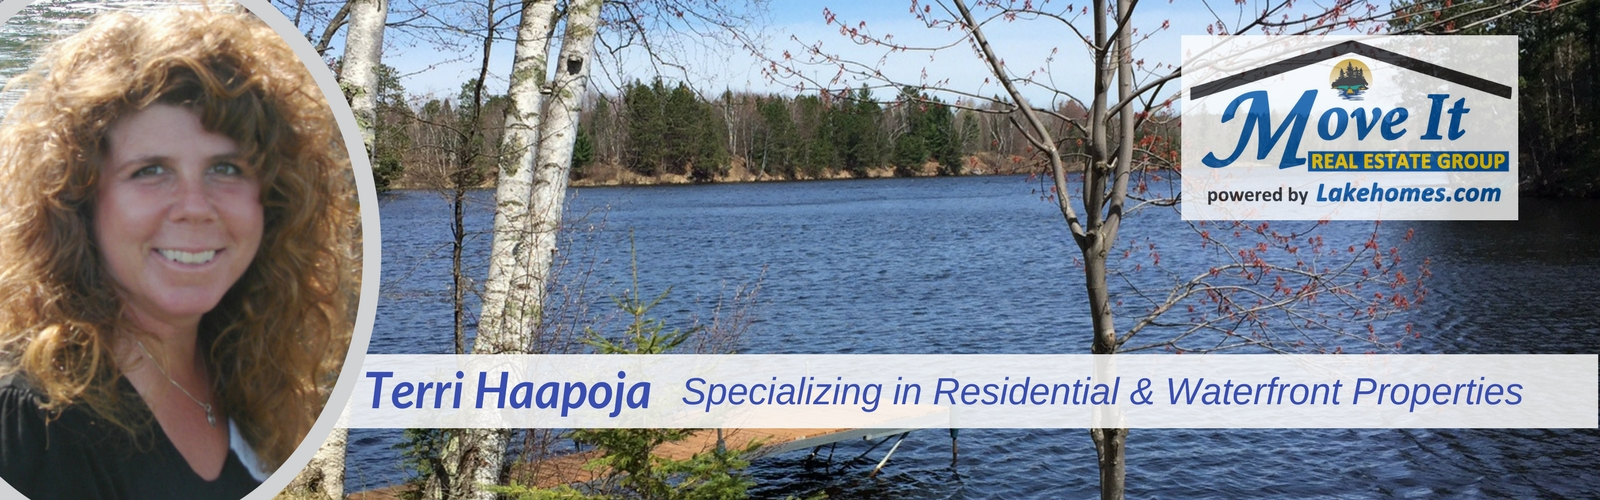 Terri Haapoja, Move It Real Estate Group